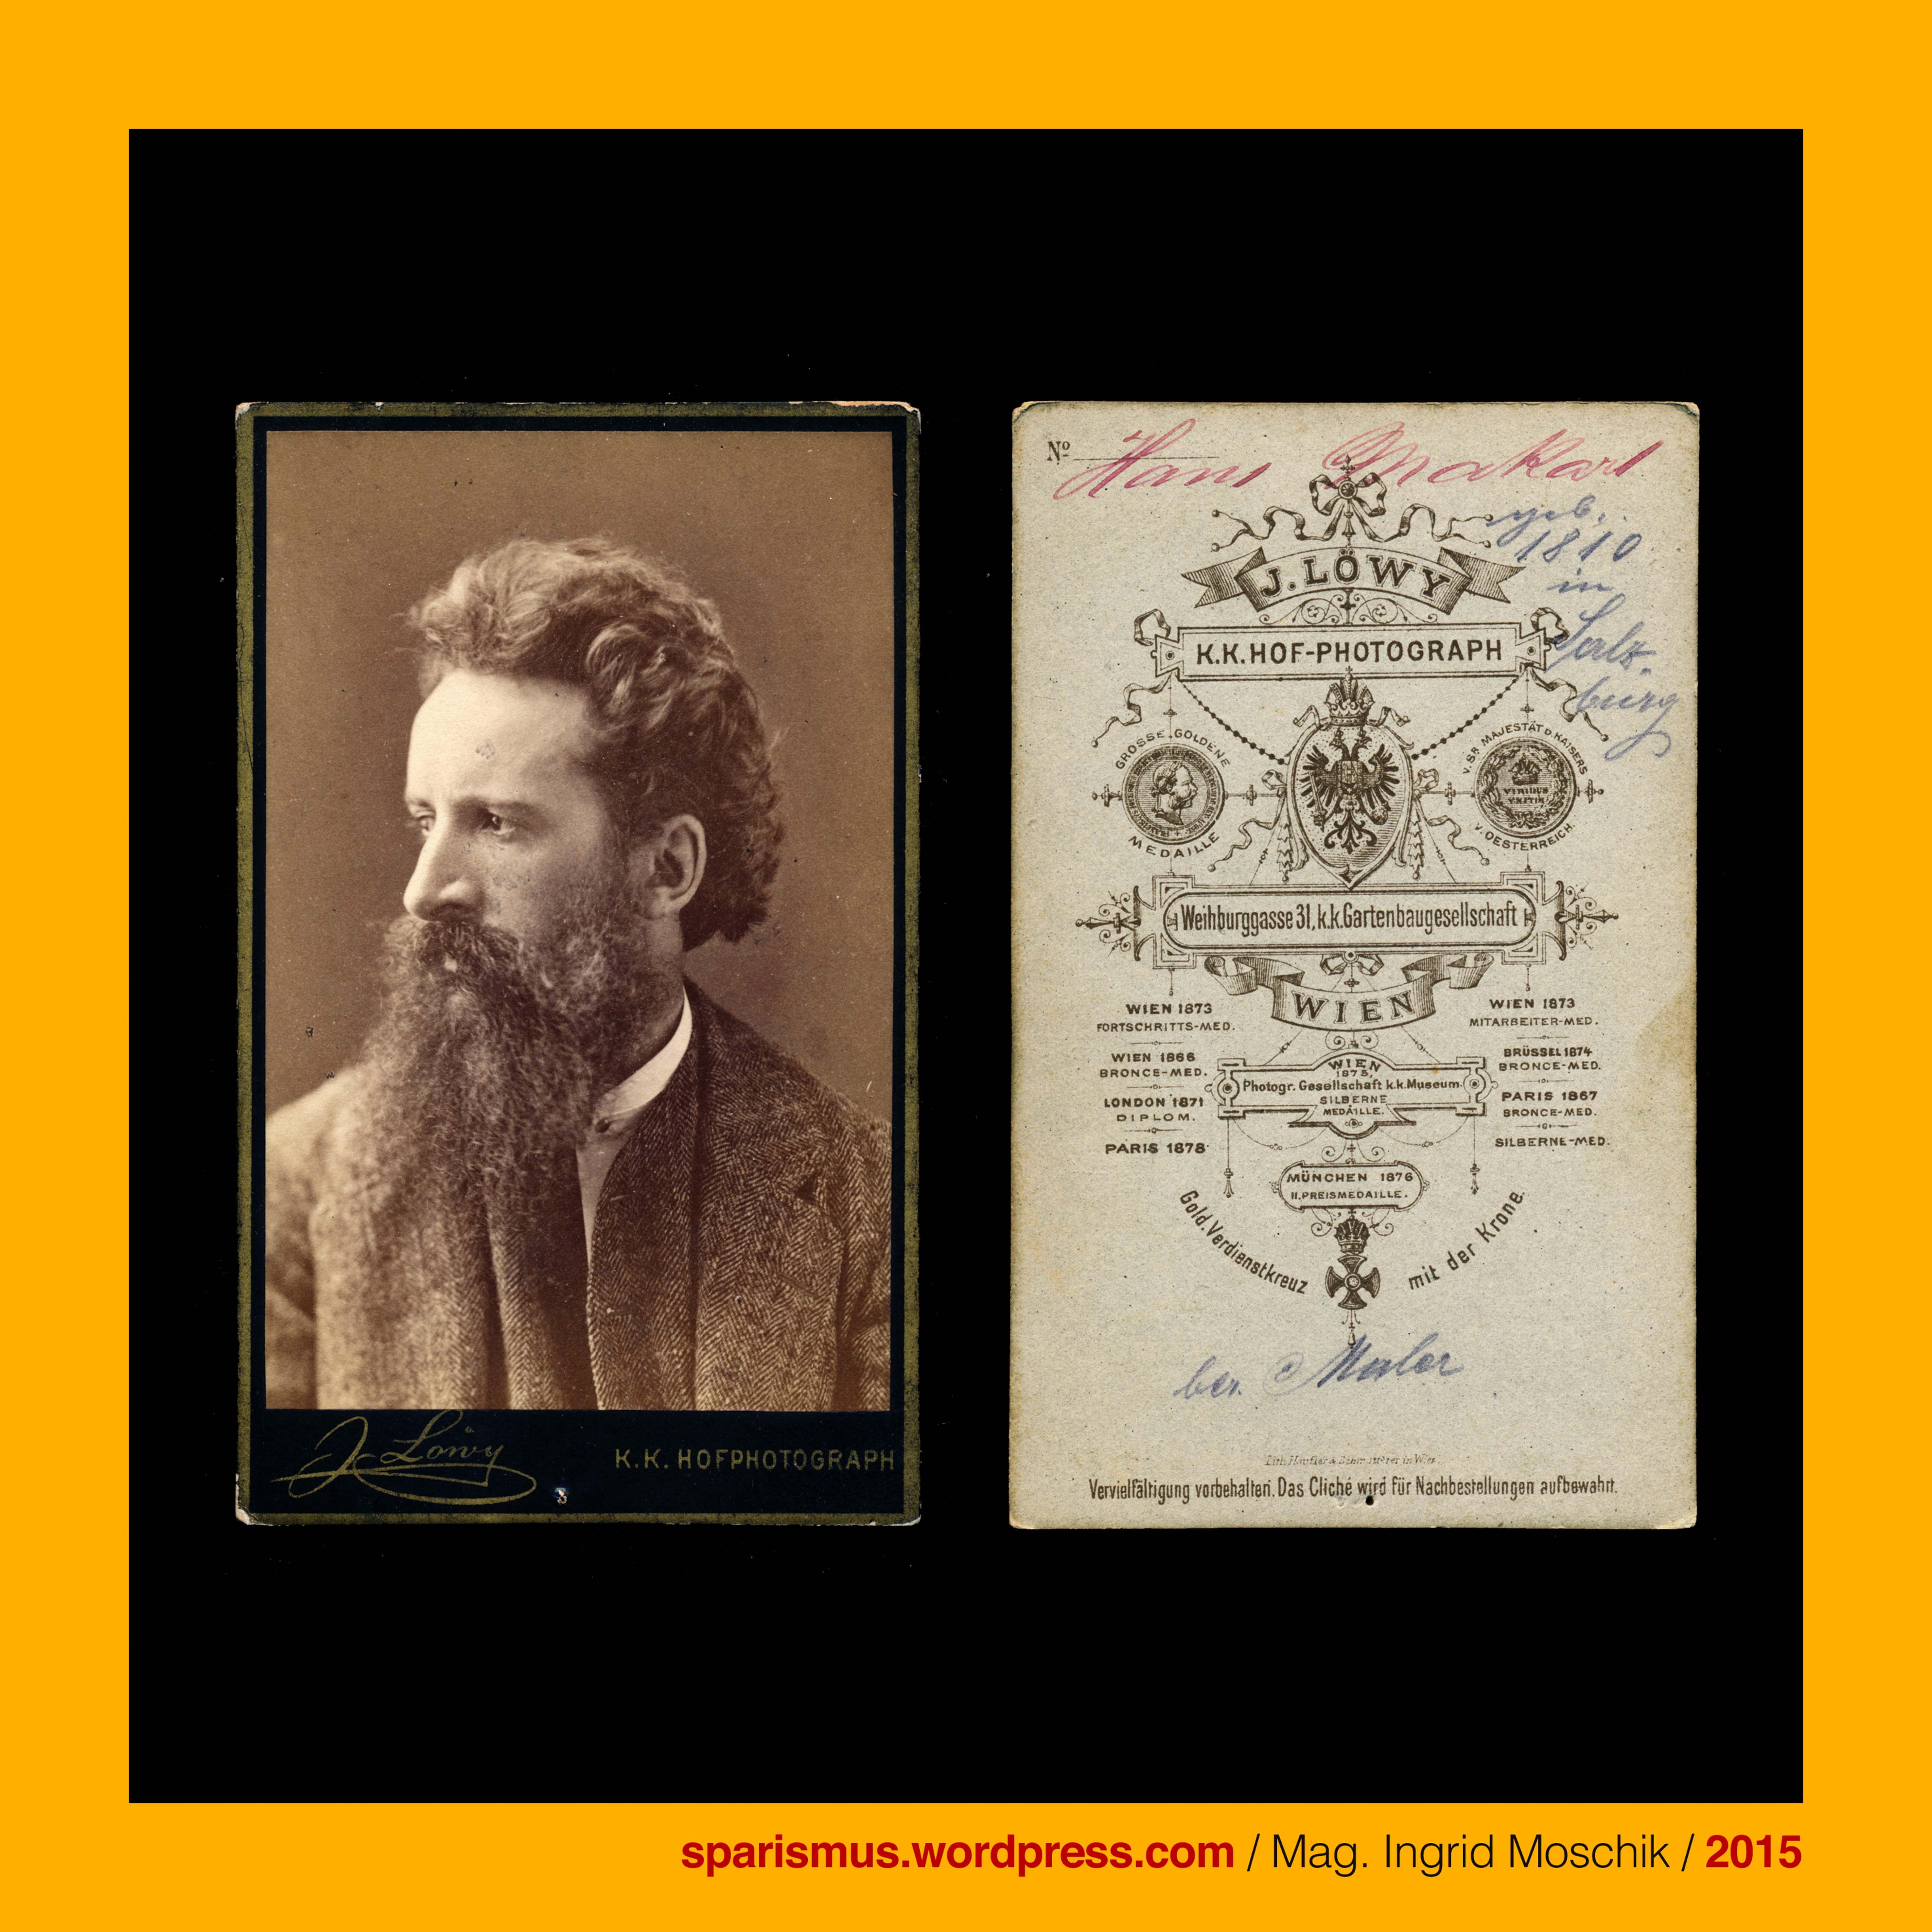 Josef Lowy Fotograf In Wien Stadt Weihburggasse 31 Hans Makart Maler Dekorationskunstler Um 1880